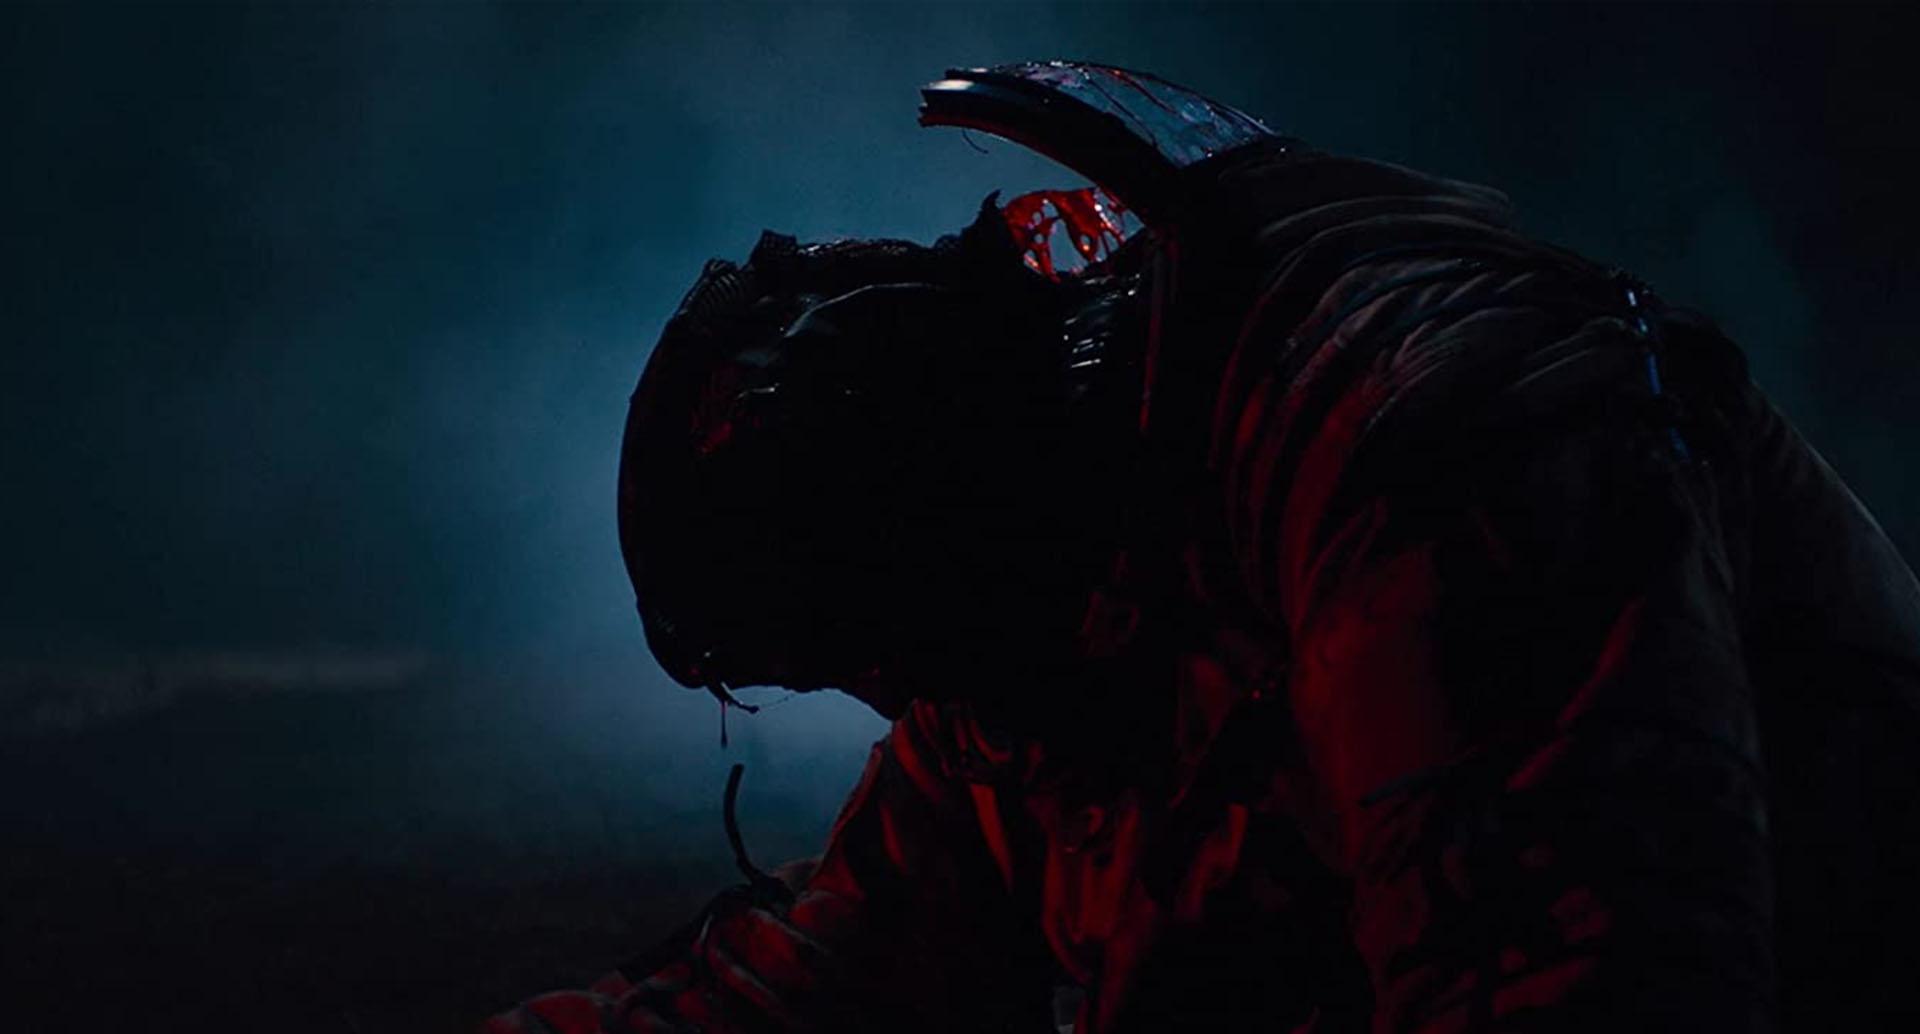 Trailer from Upcoming Russian Sci-Fi Horror 'Sputnik'